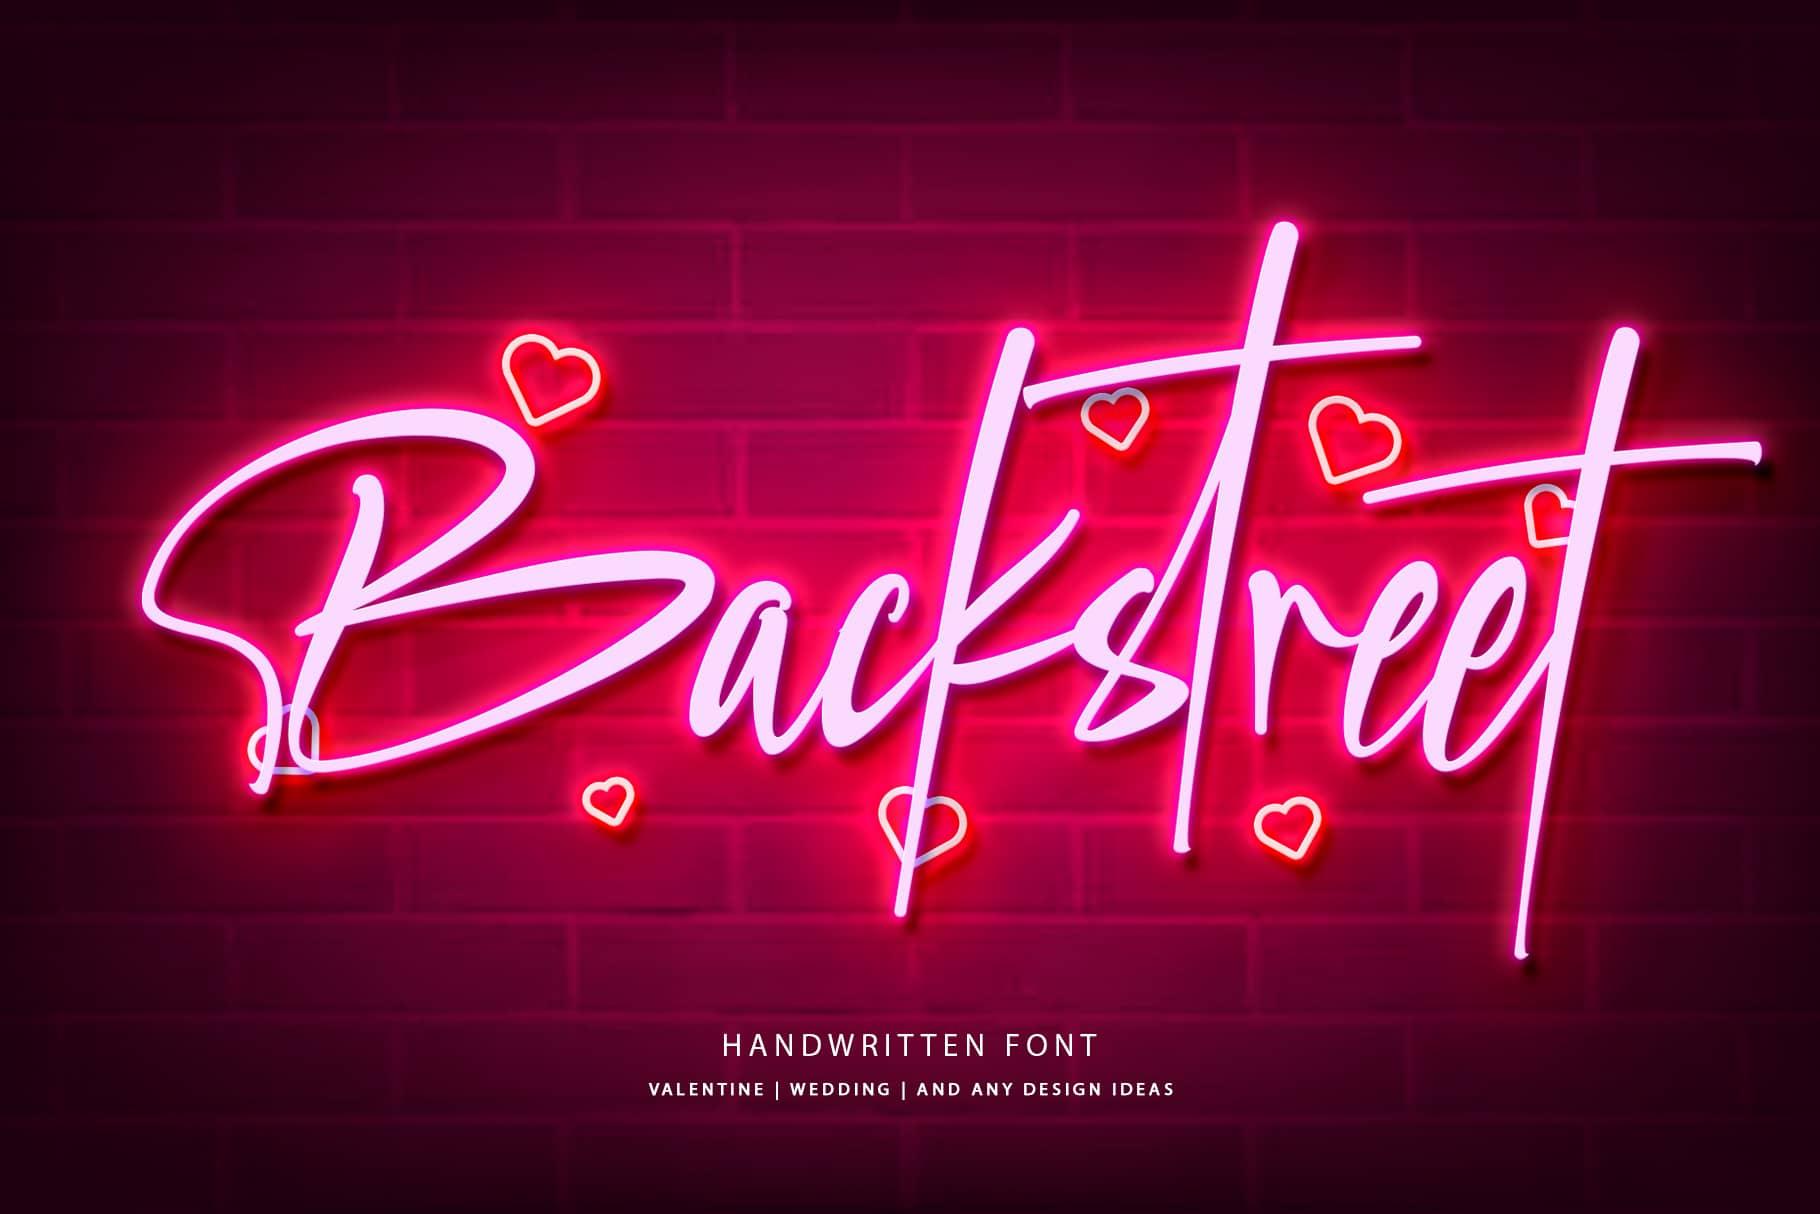 backstreet font